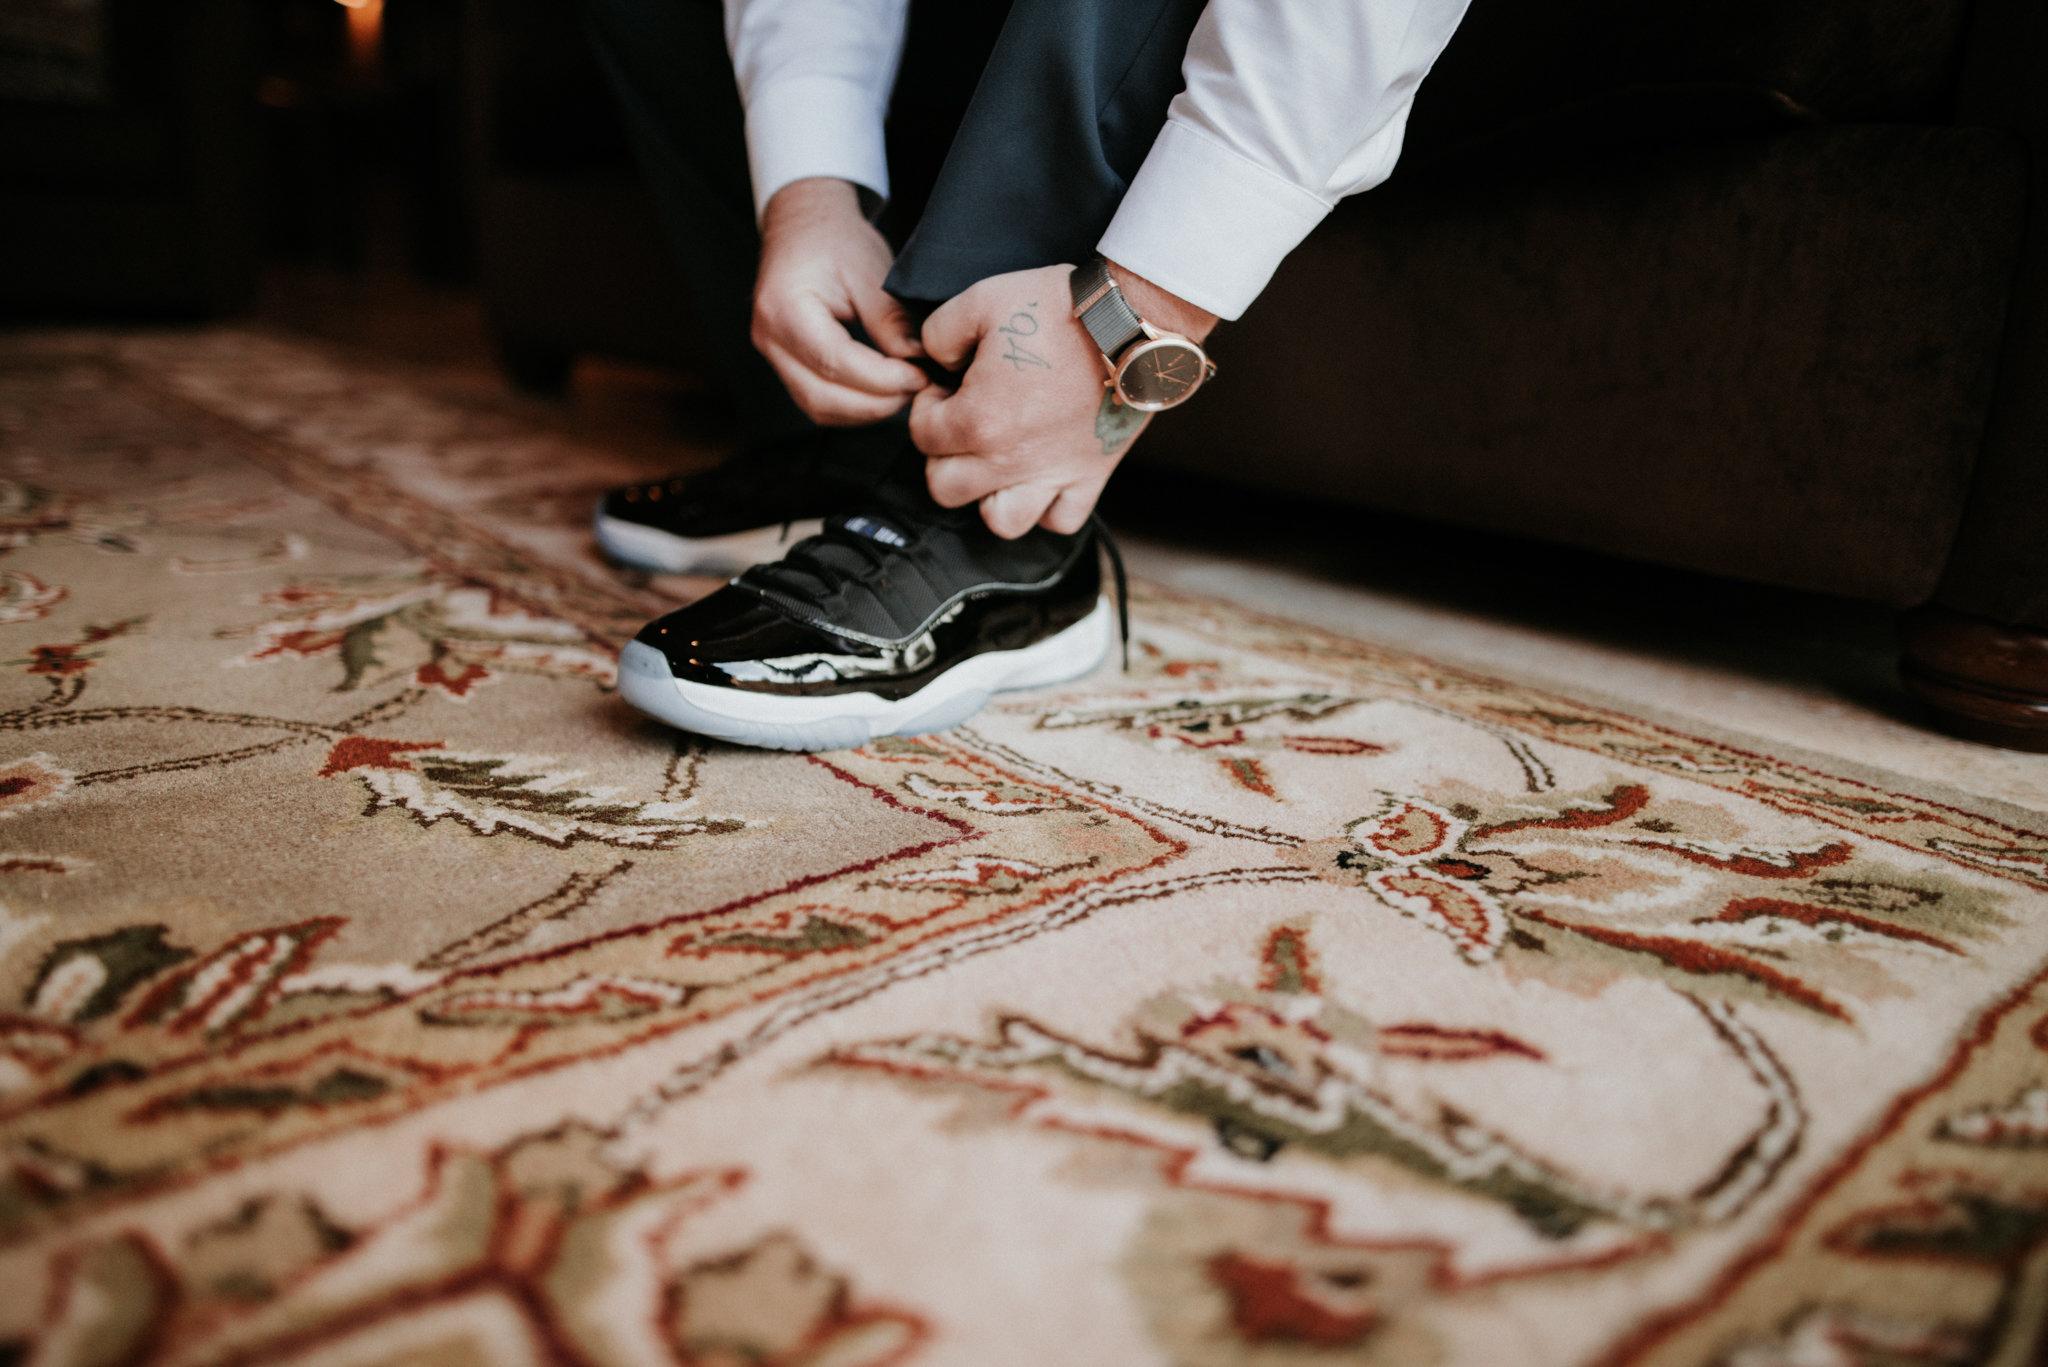 colorado elopement lake dillon sapphire point Zach&Rosalie St. Louis Wedding Photographer--12.jpg